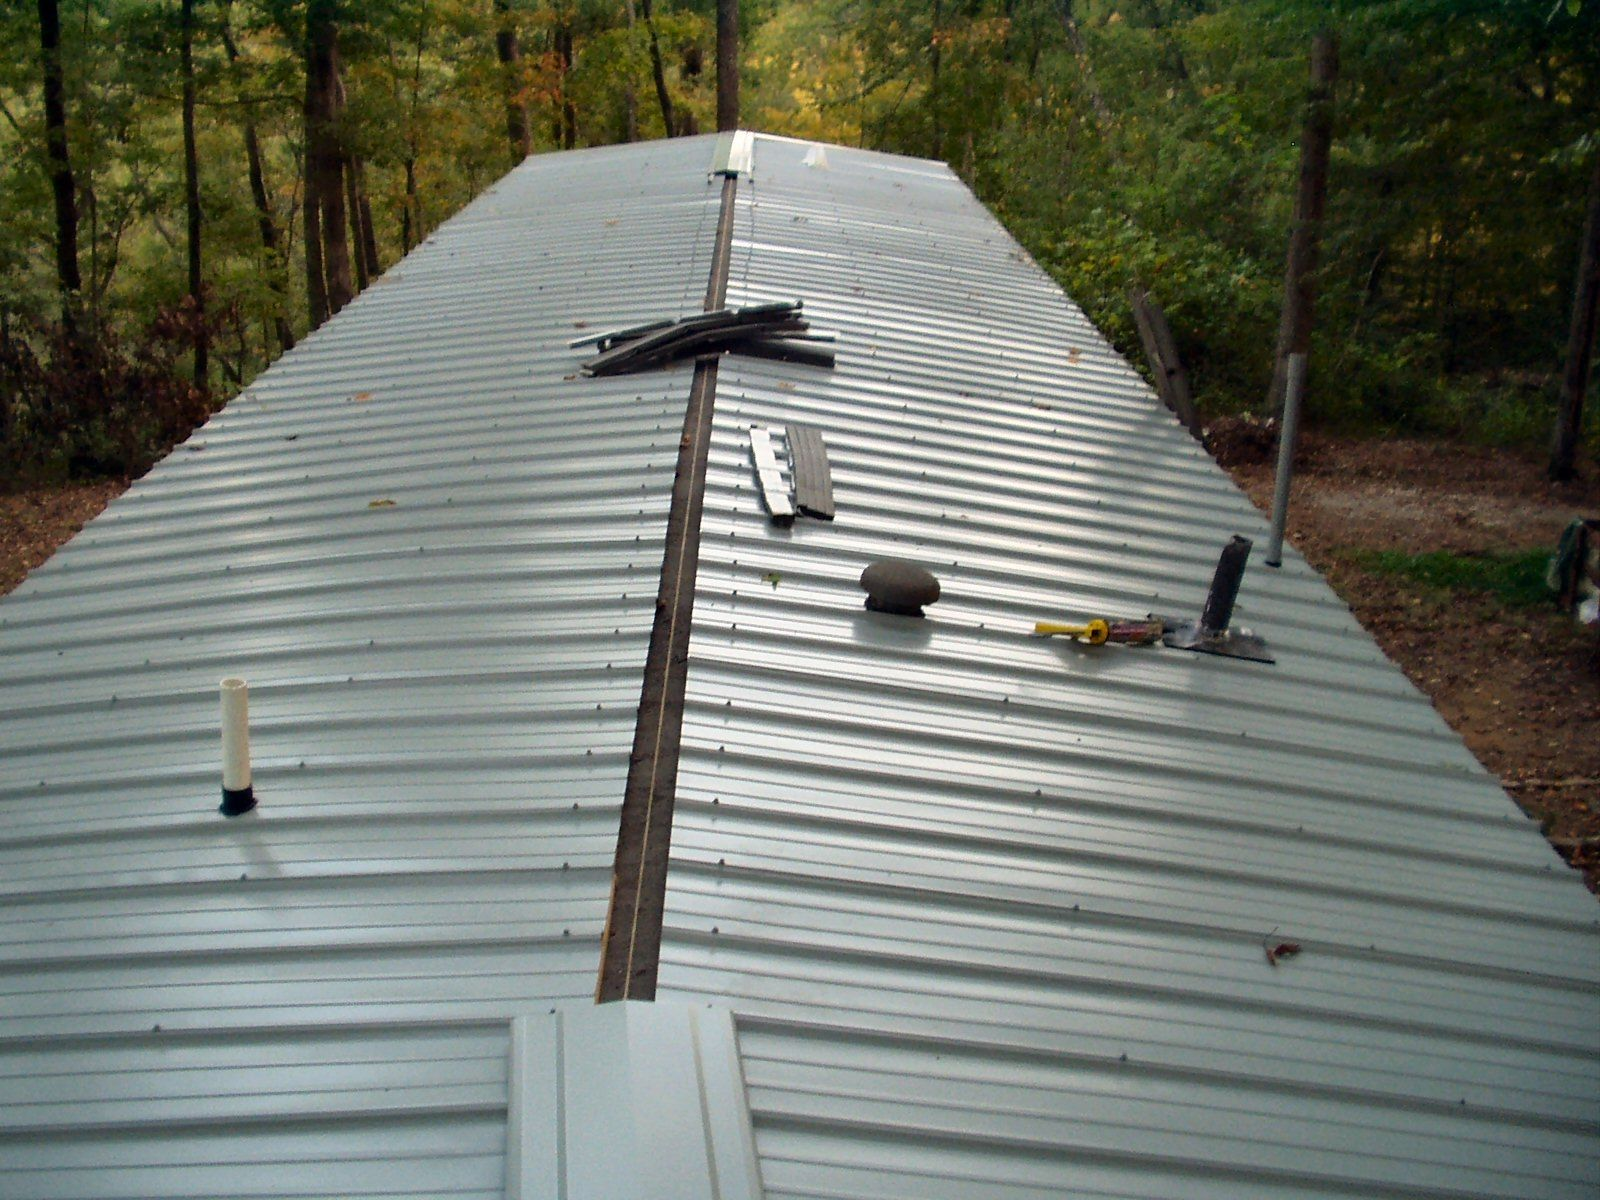 Put Metal Roof Mobile Home Put Metal Roof Mobile Home Mobile Home Metal Roof Installation Roof Mobile Home Roof Remodeling Mobile Homes Mobile Home Renovations